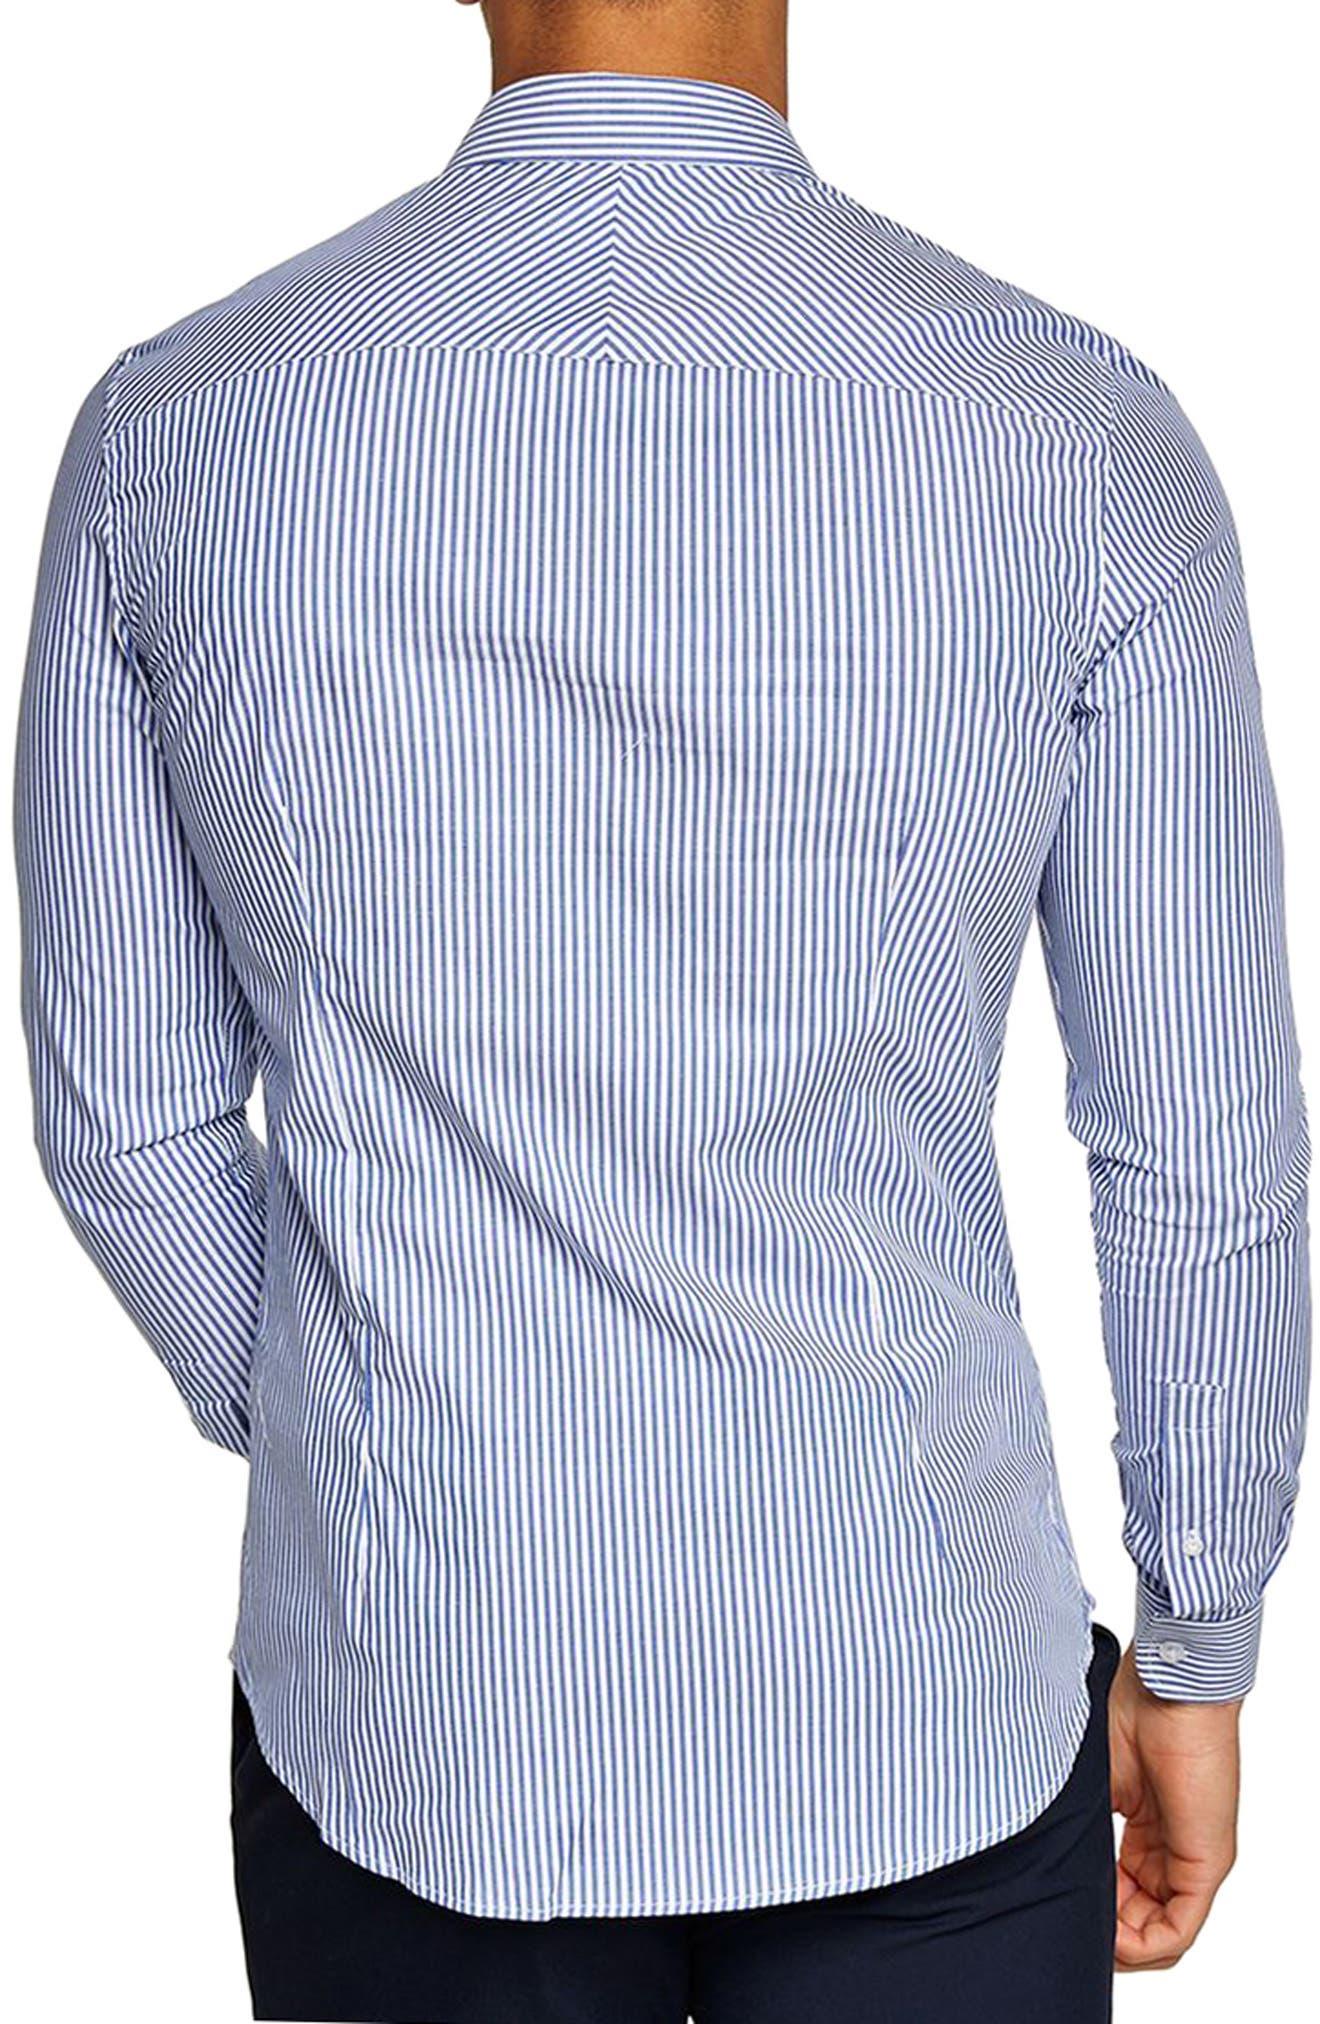 Muscle Fit Stripe Shirt,                             Alternate thumbnail 2, color,                             400